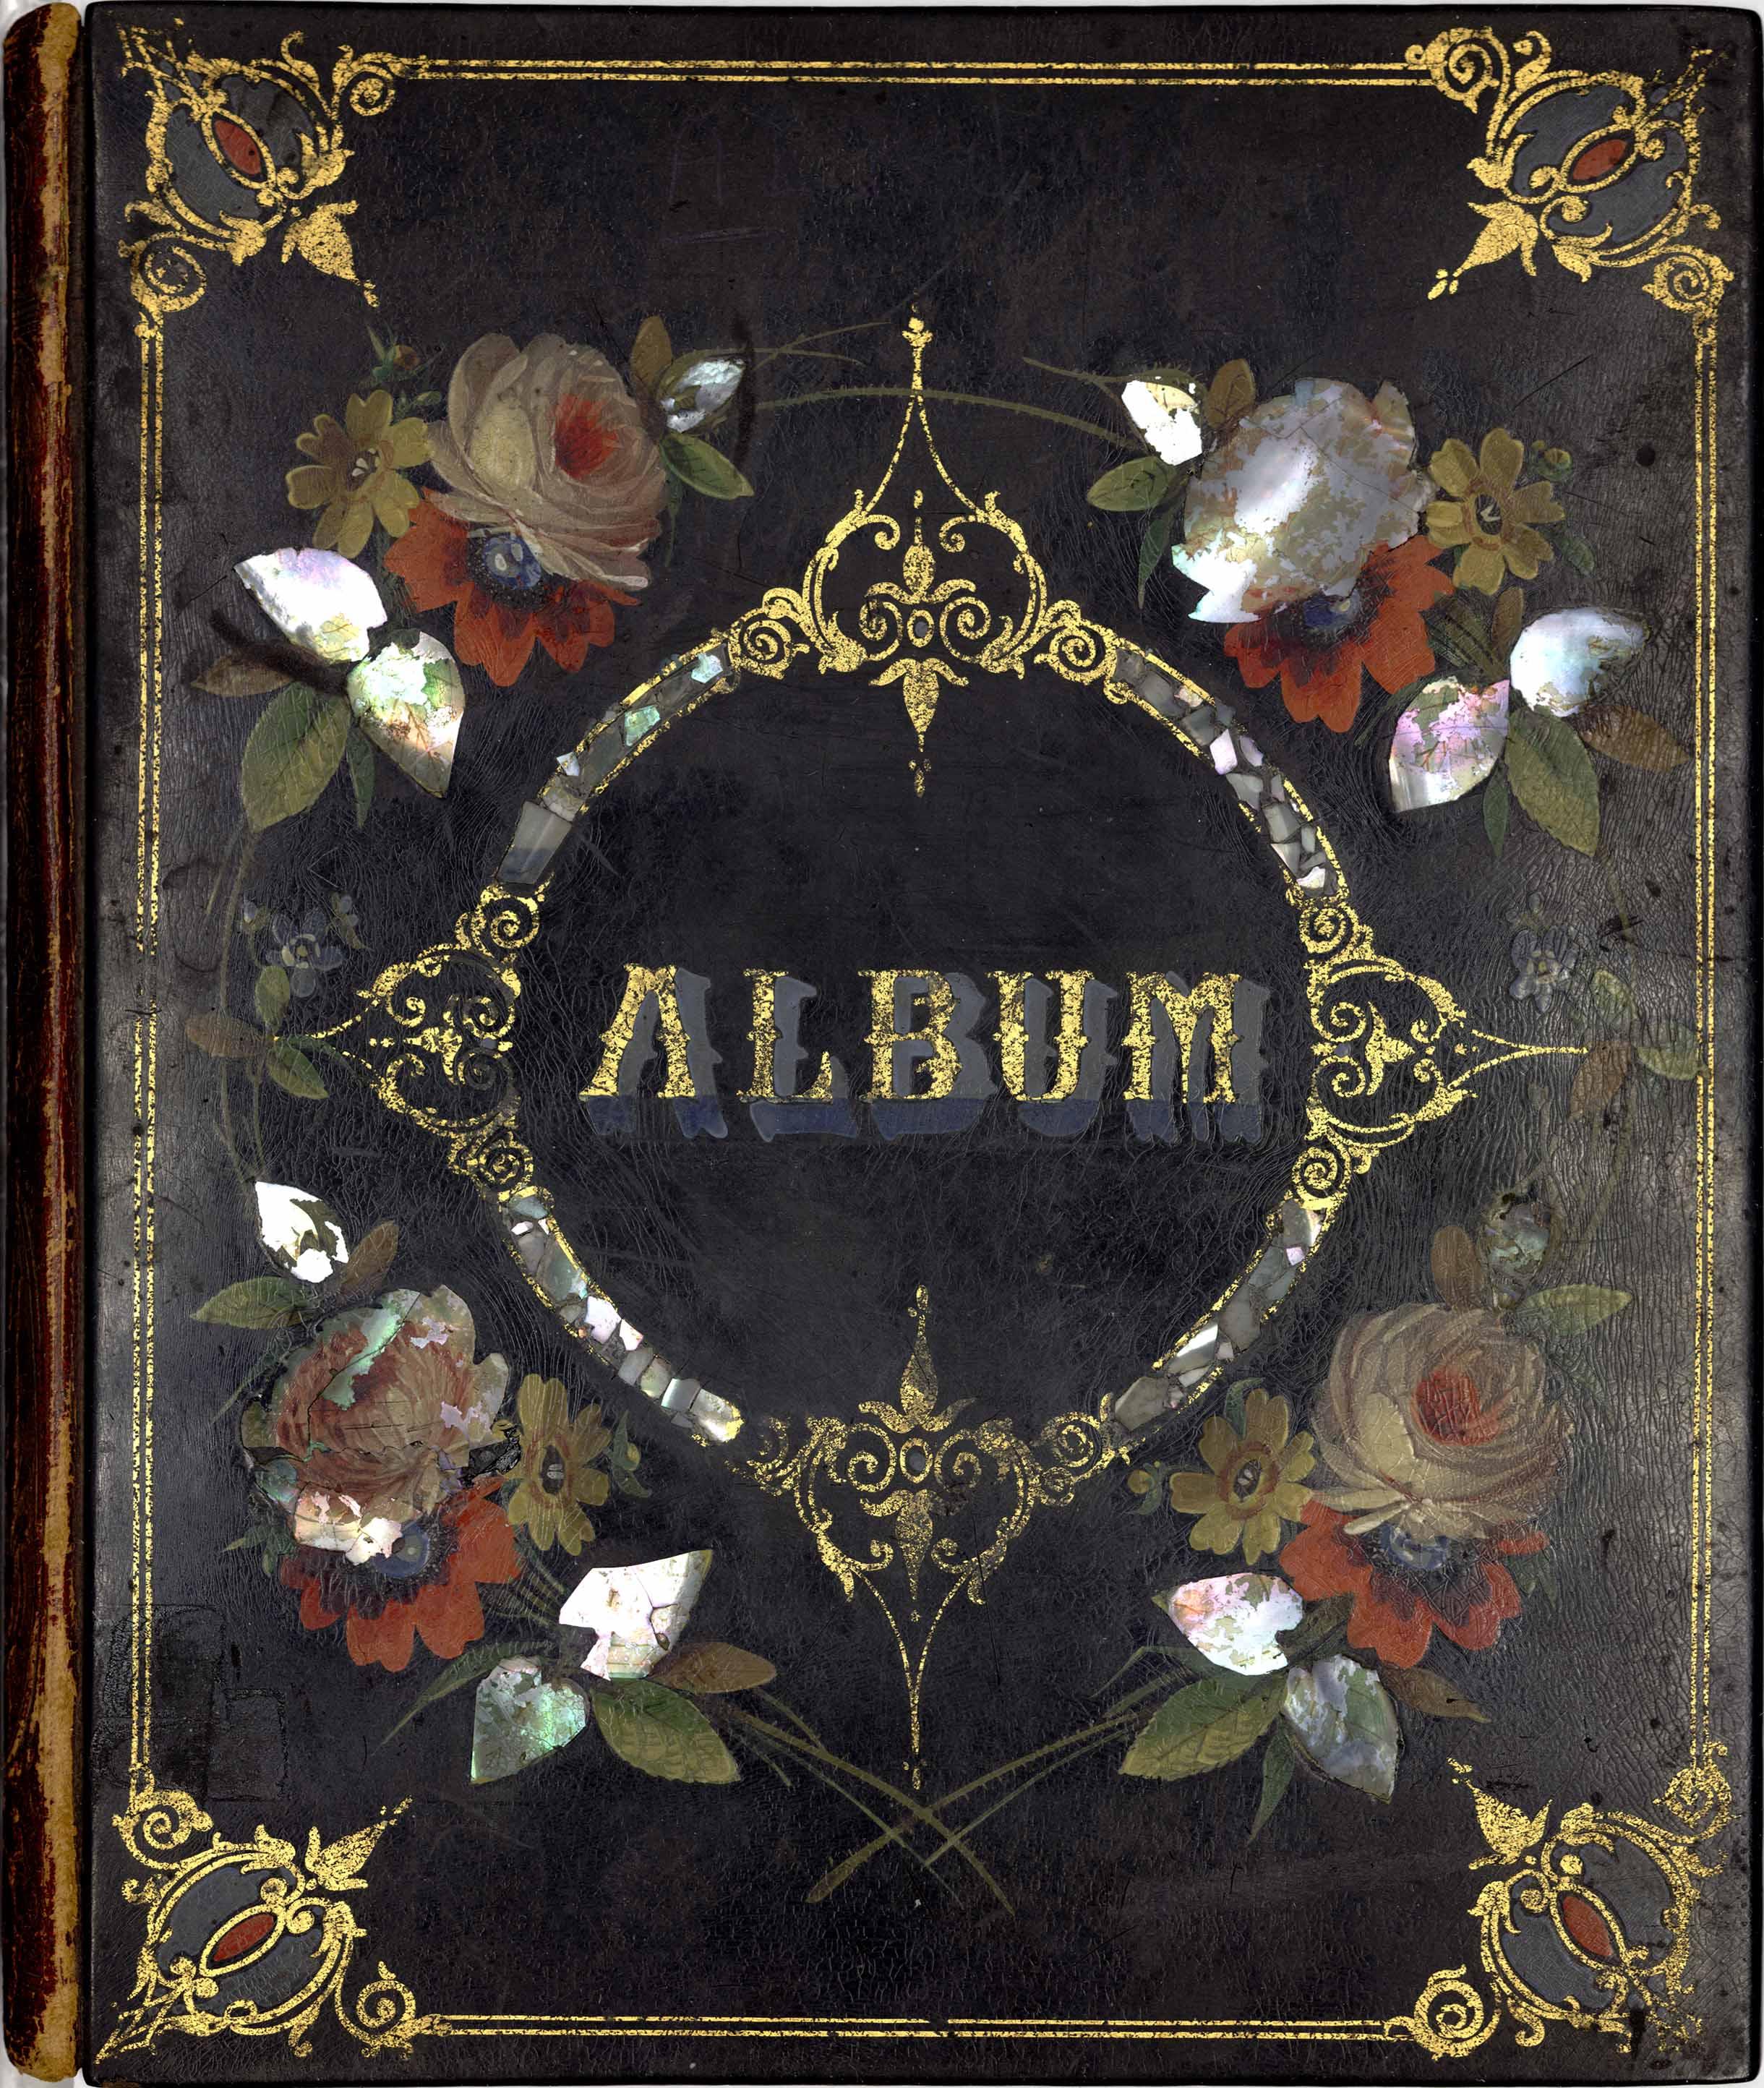 Cherished Memories scrapbook ornate cover